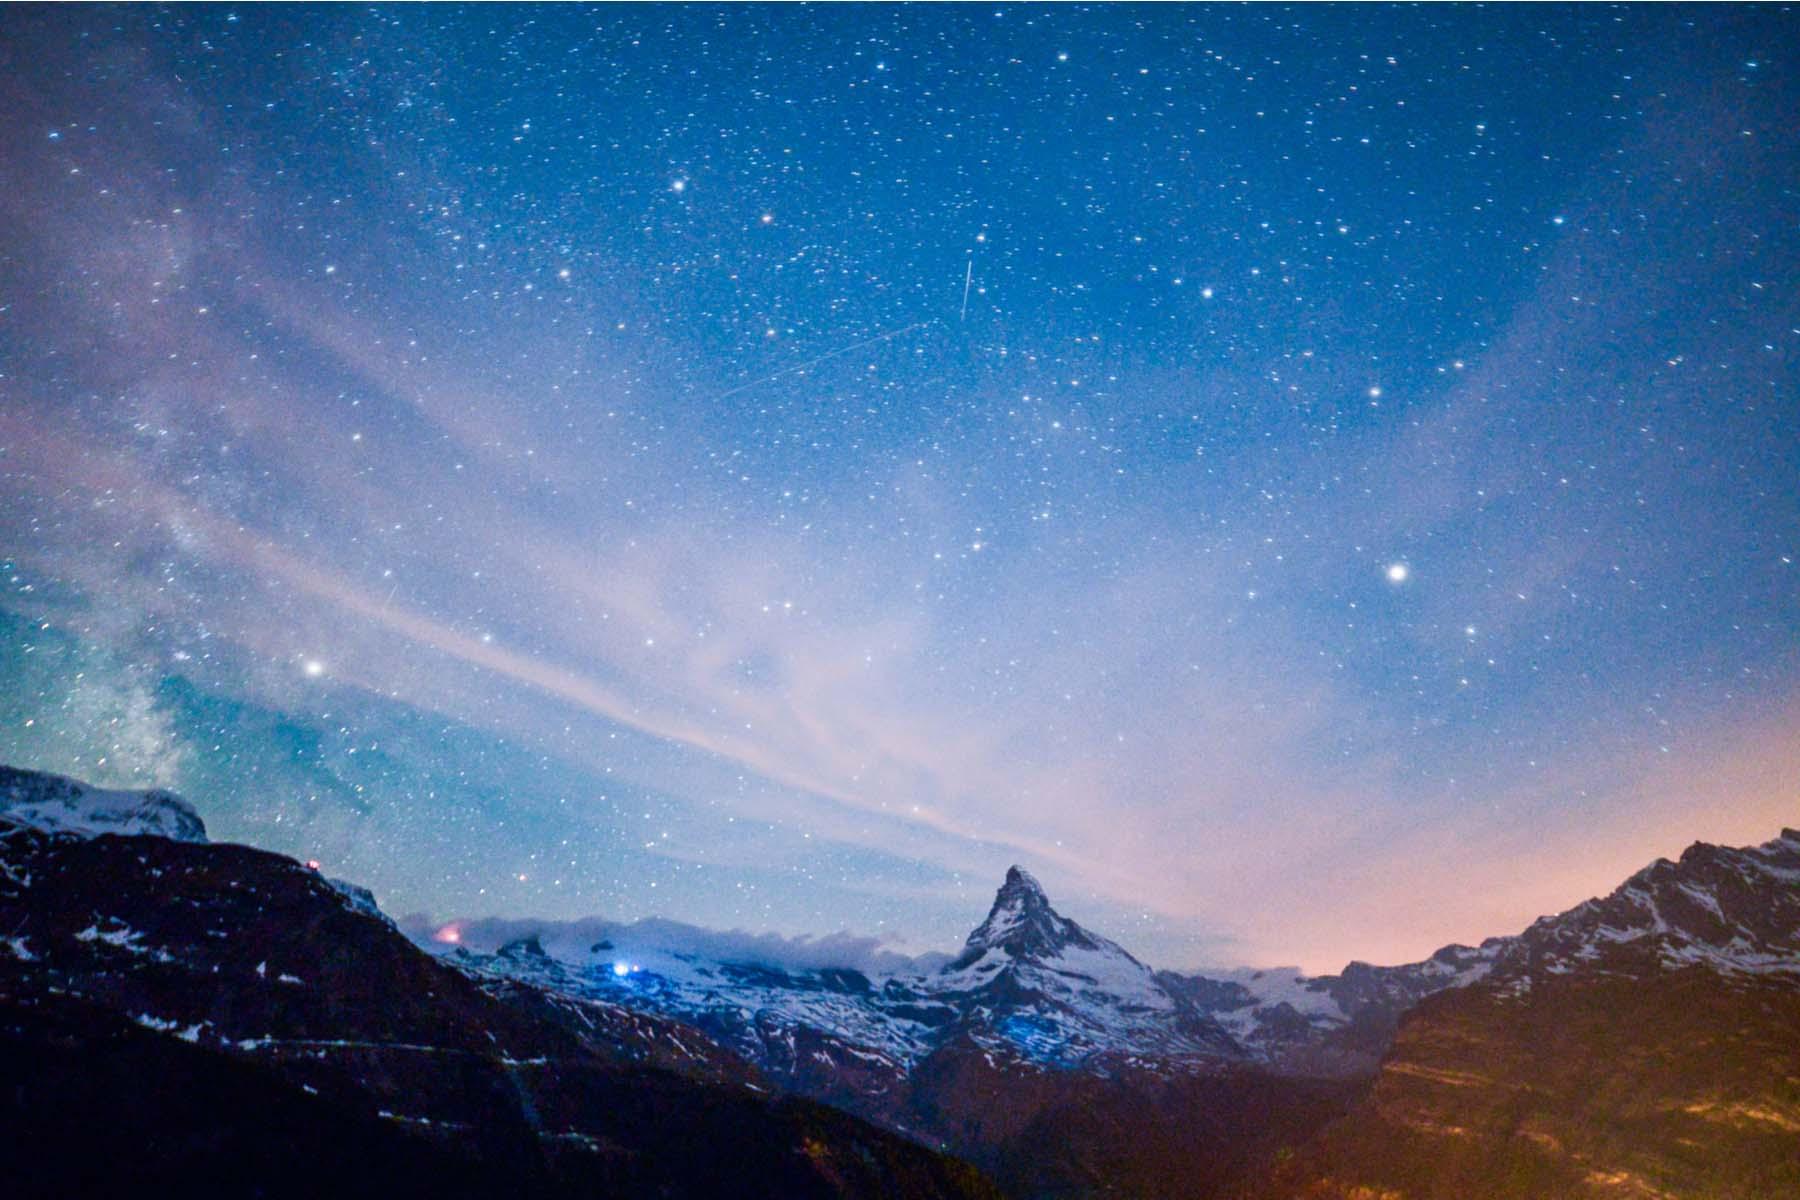 Stargazing in Zermatt